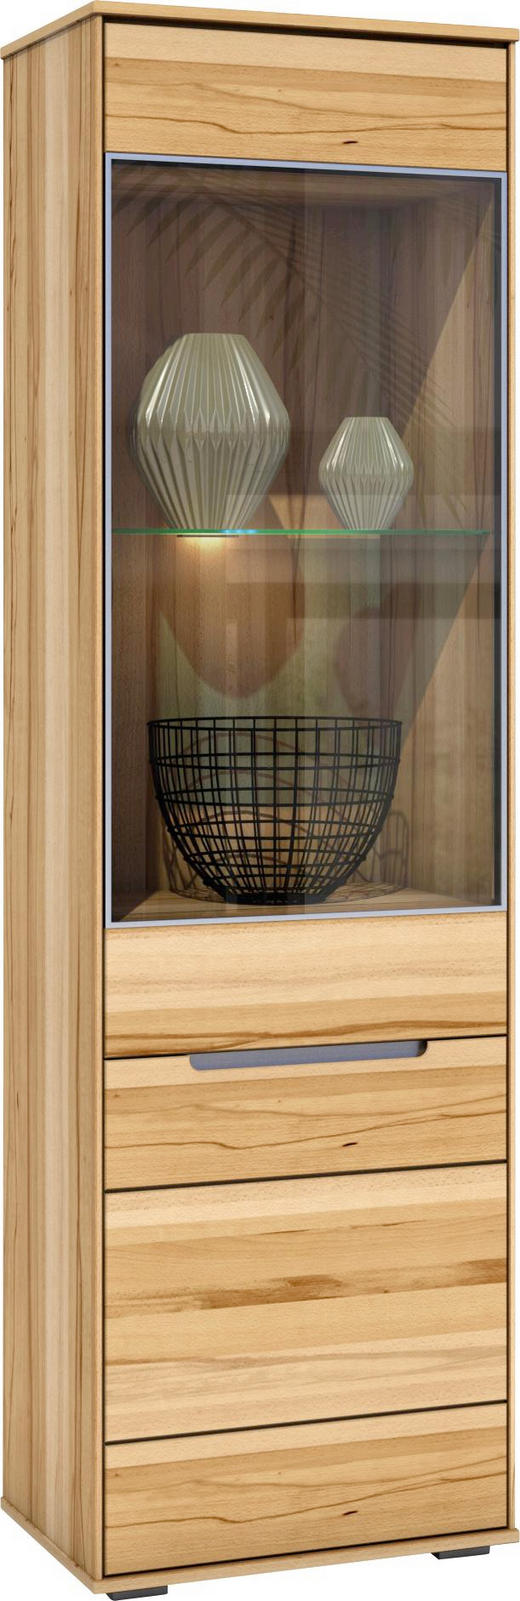 VITRINE Kernbuche massiv Buchefarben - Buchefarben, LIFESTYLE, Glas/Holz (60/203/42cm) - Carryhome